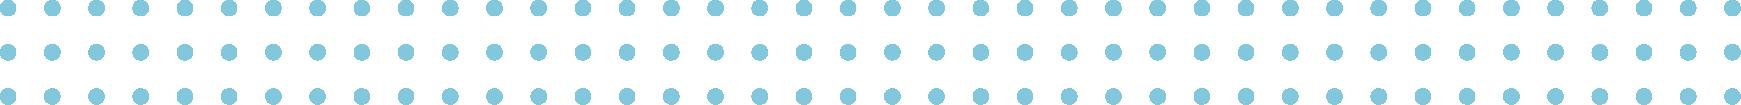 blue-dots